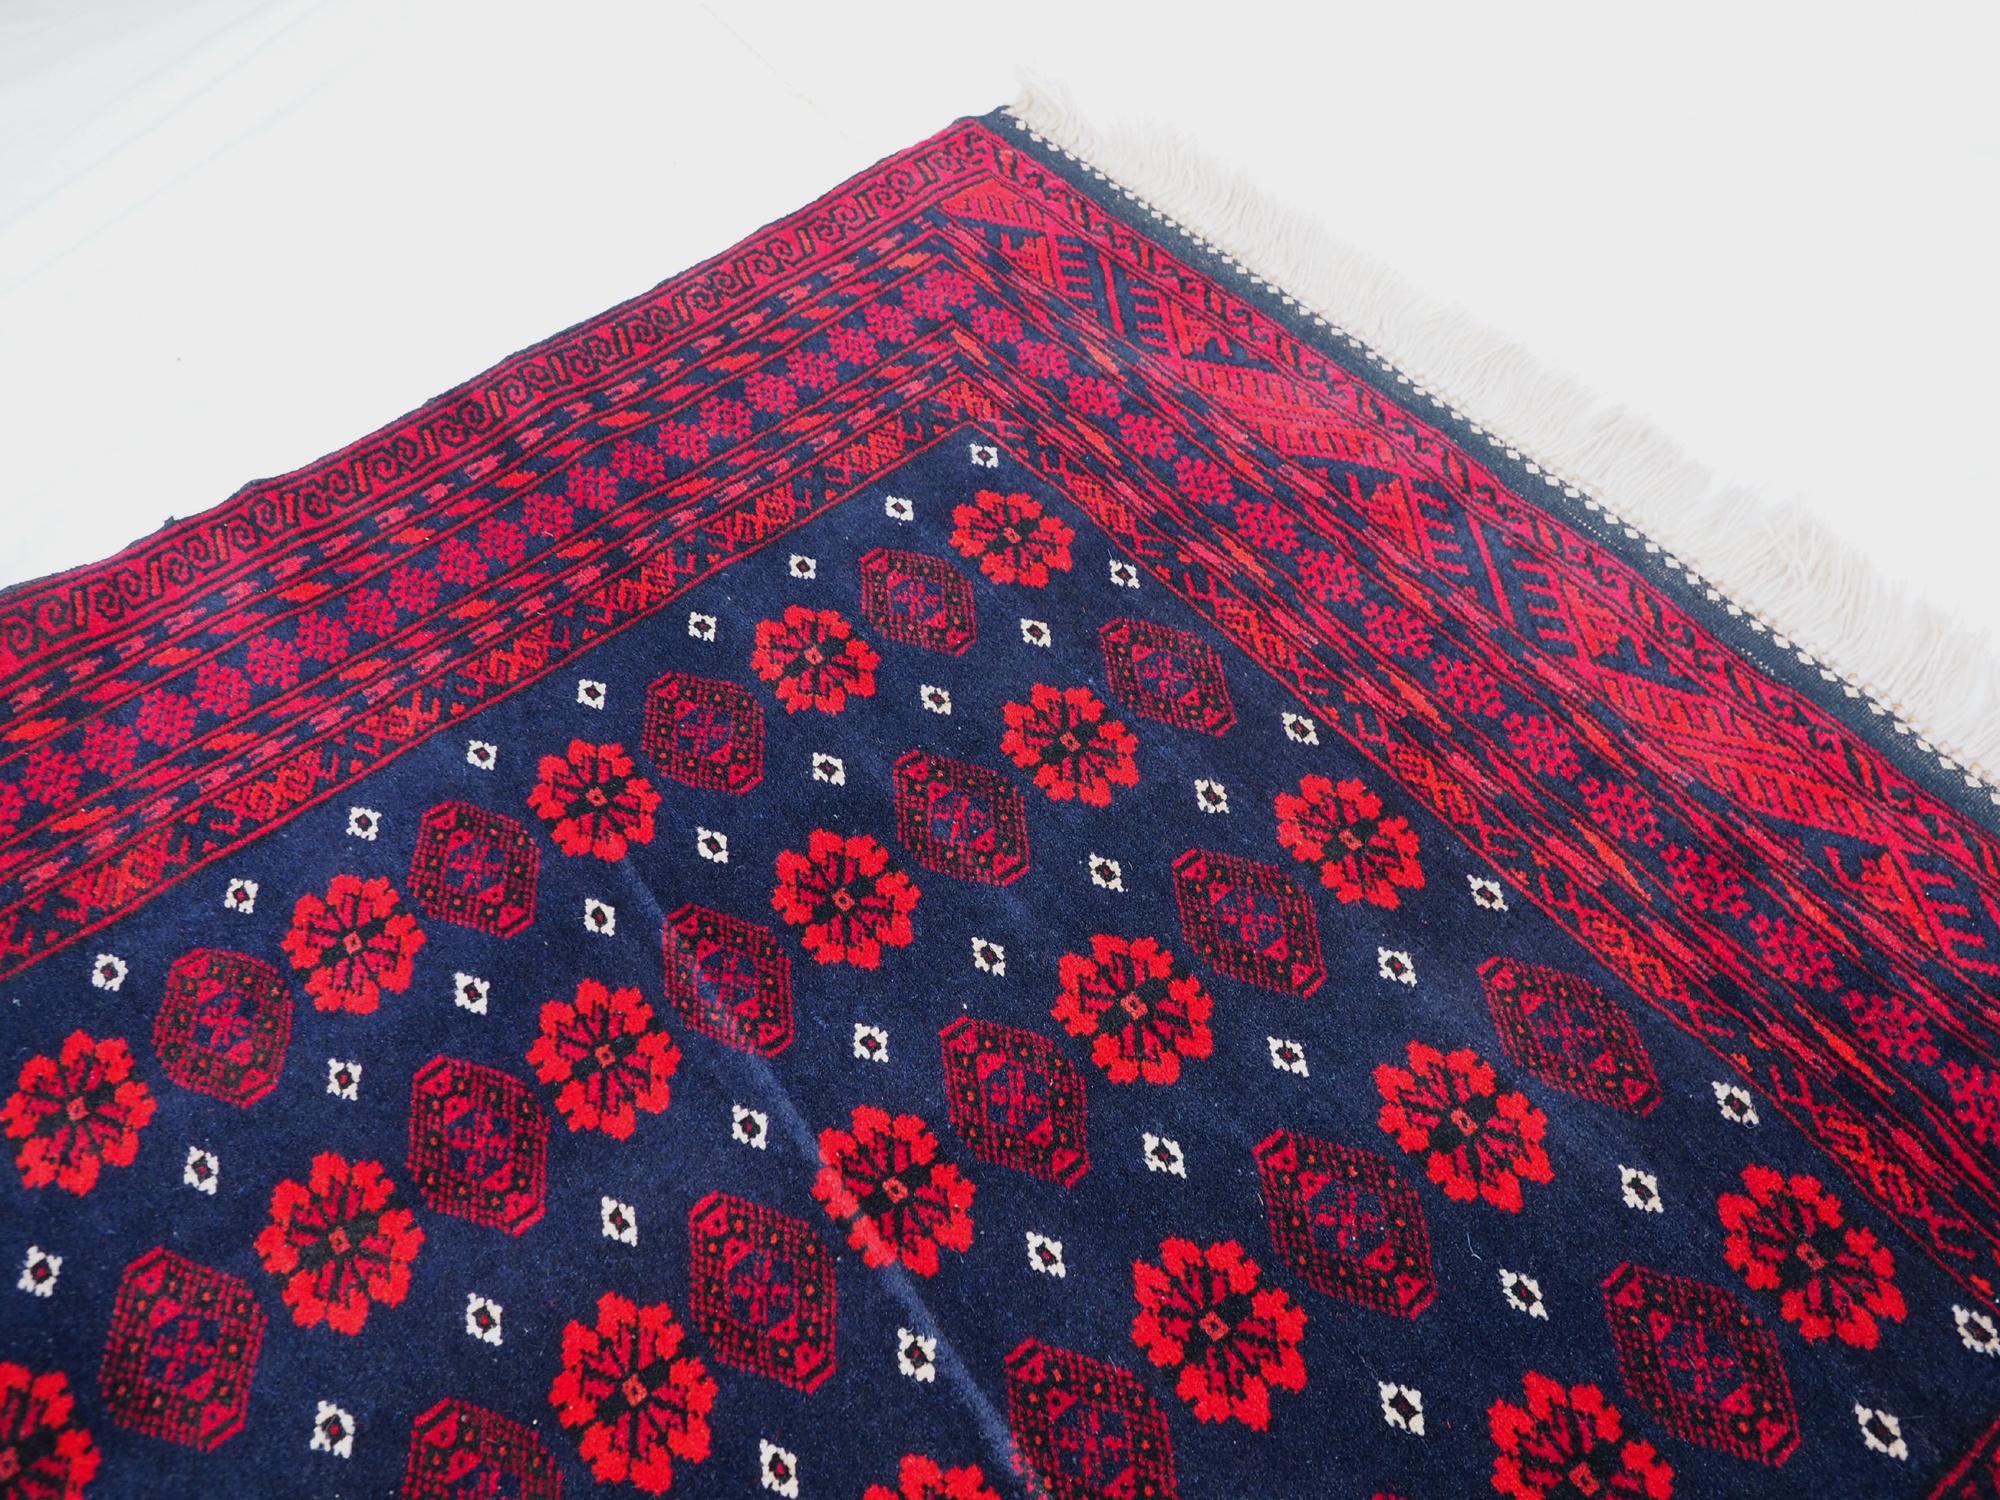 4,8x3,1 ft tribal Nomadic Beloch Vintage carpet rug runner carpet stair carpet corridor Hallway  No:21/1